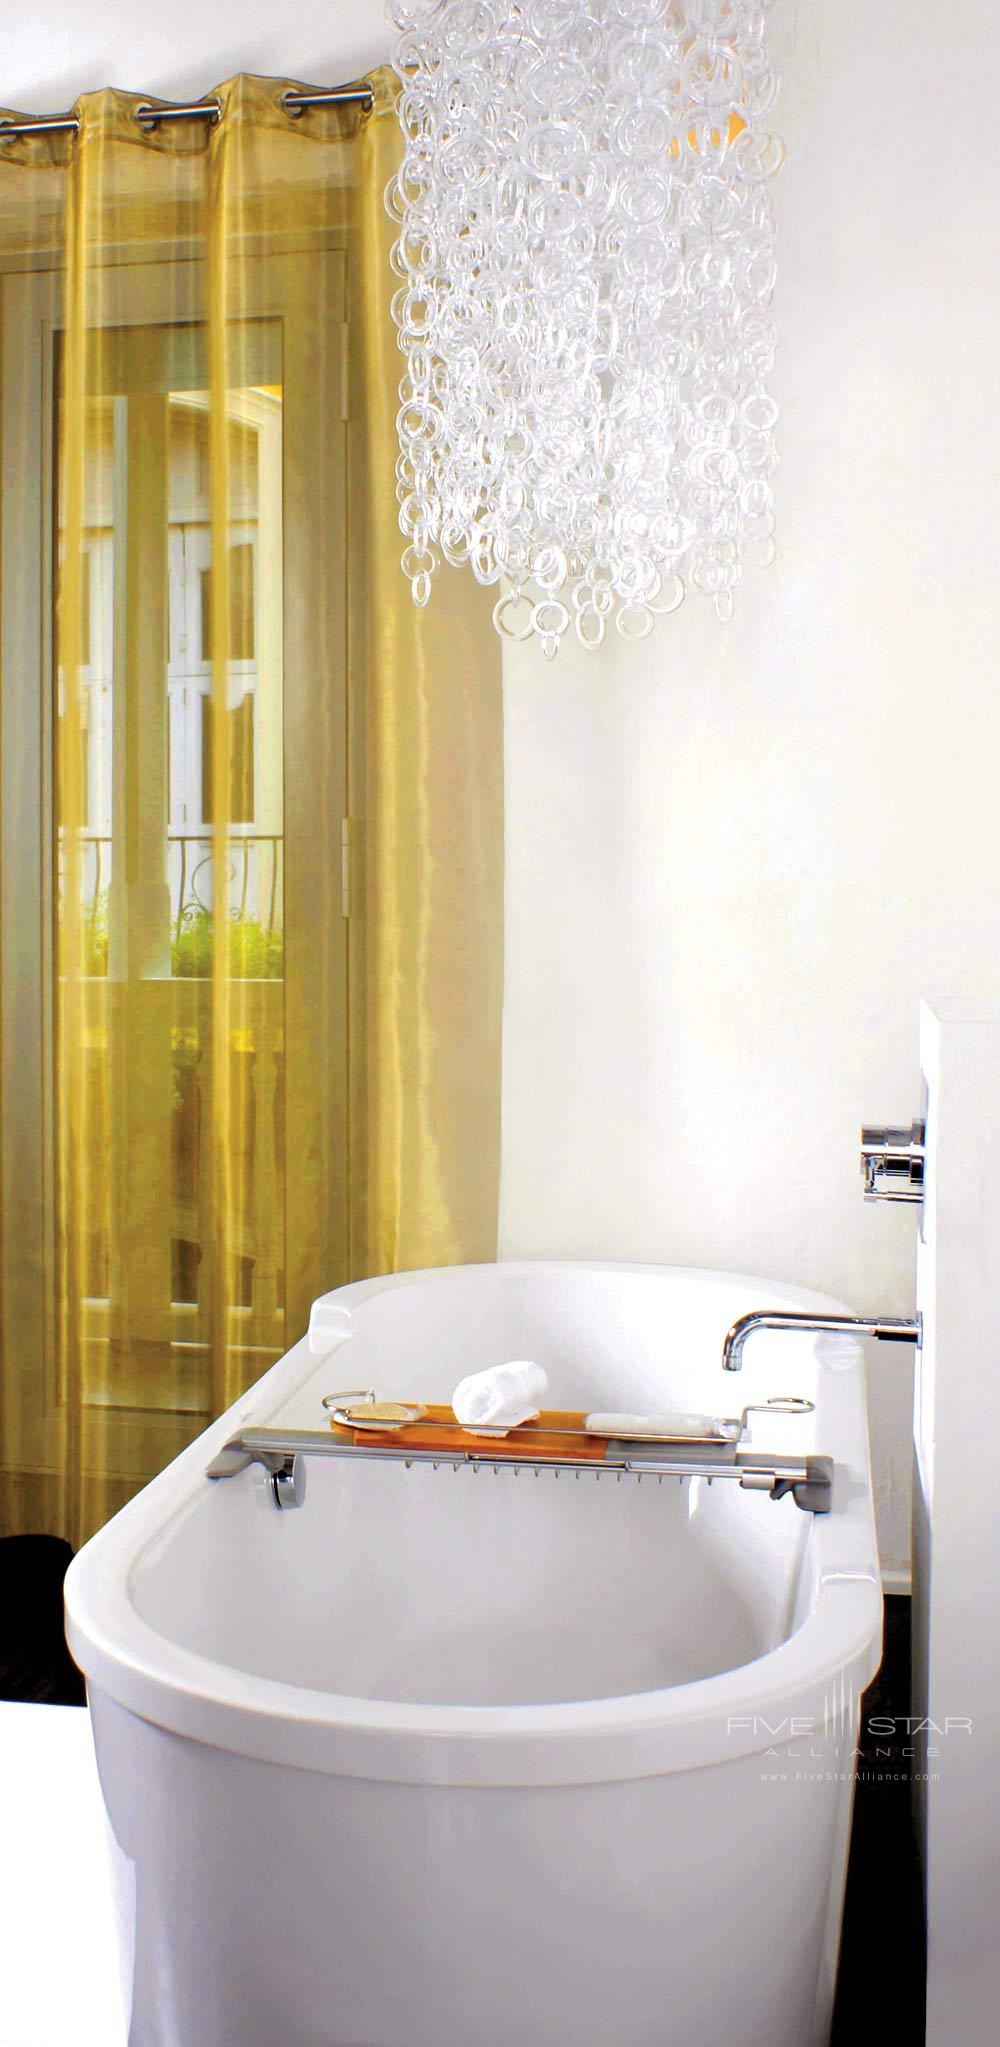 Peau de Soie room Bathtub at Tcherassi Hotel Cartegena, Columbia